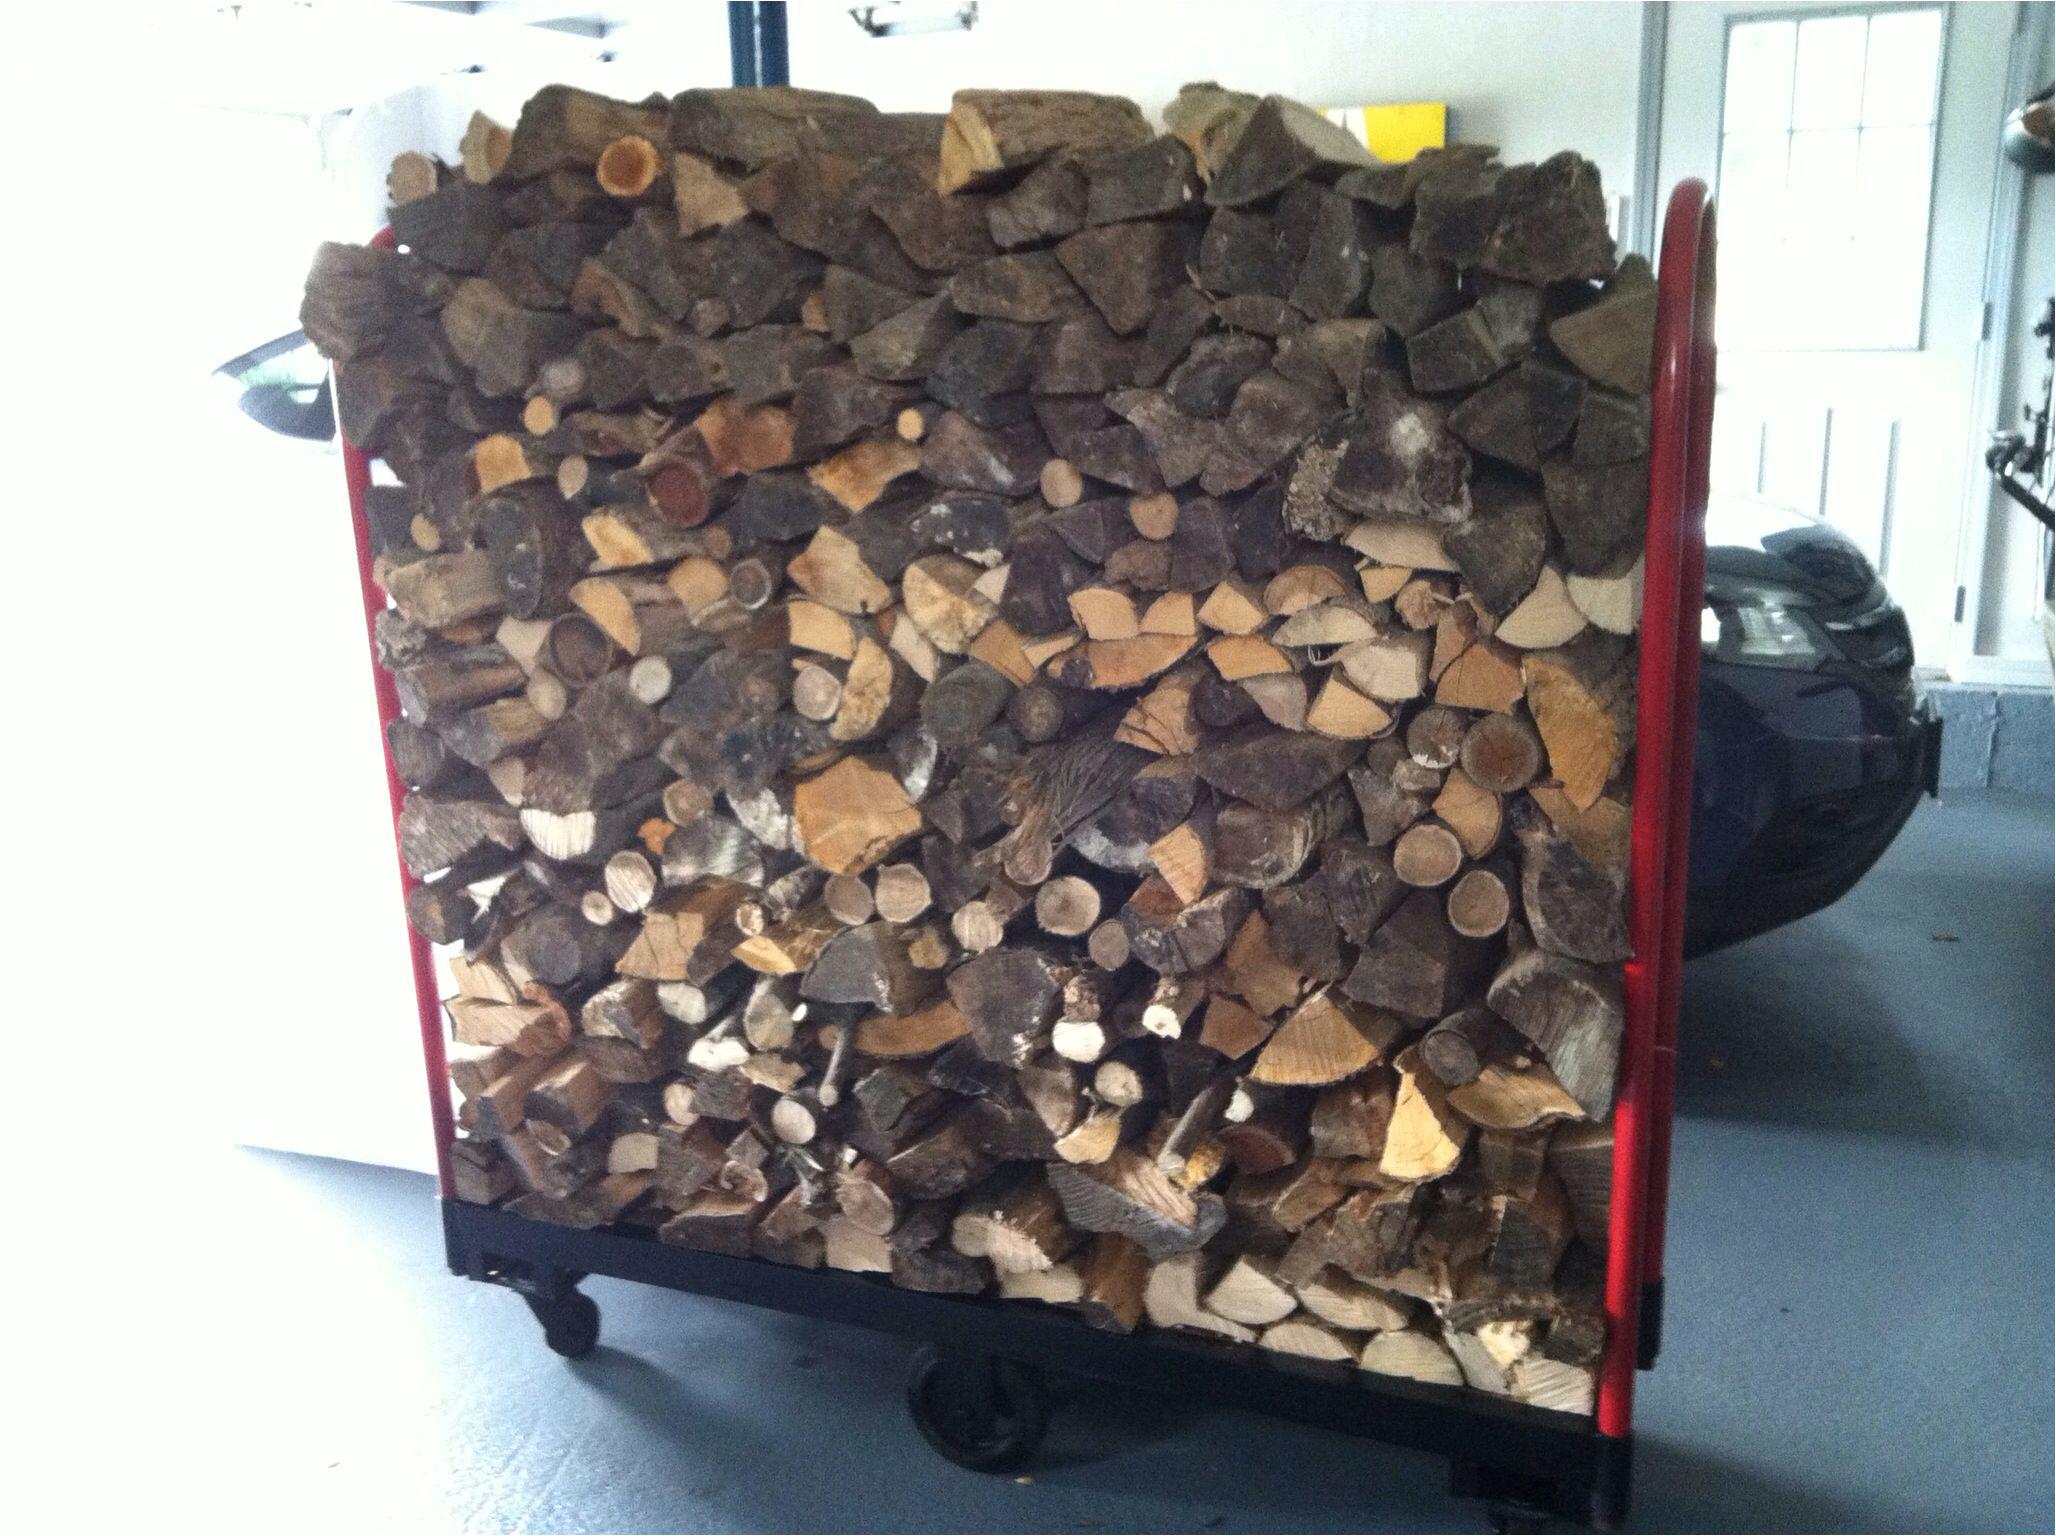 movable firewood storage firewood storage indoor firewood storage